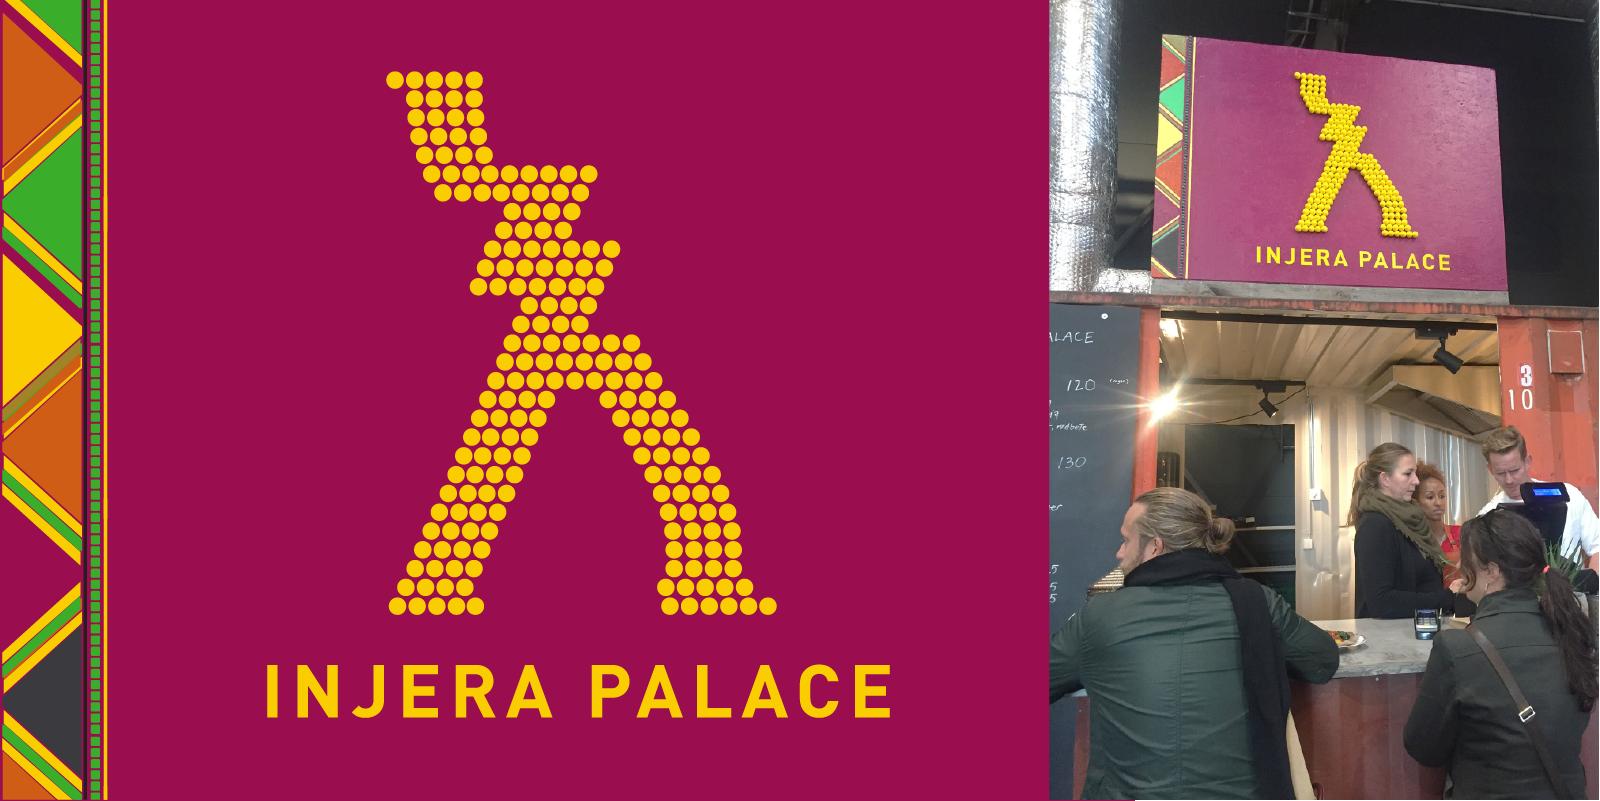 Injera Palace – skilt